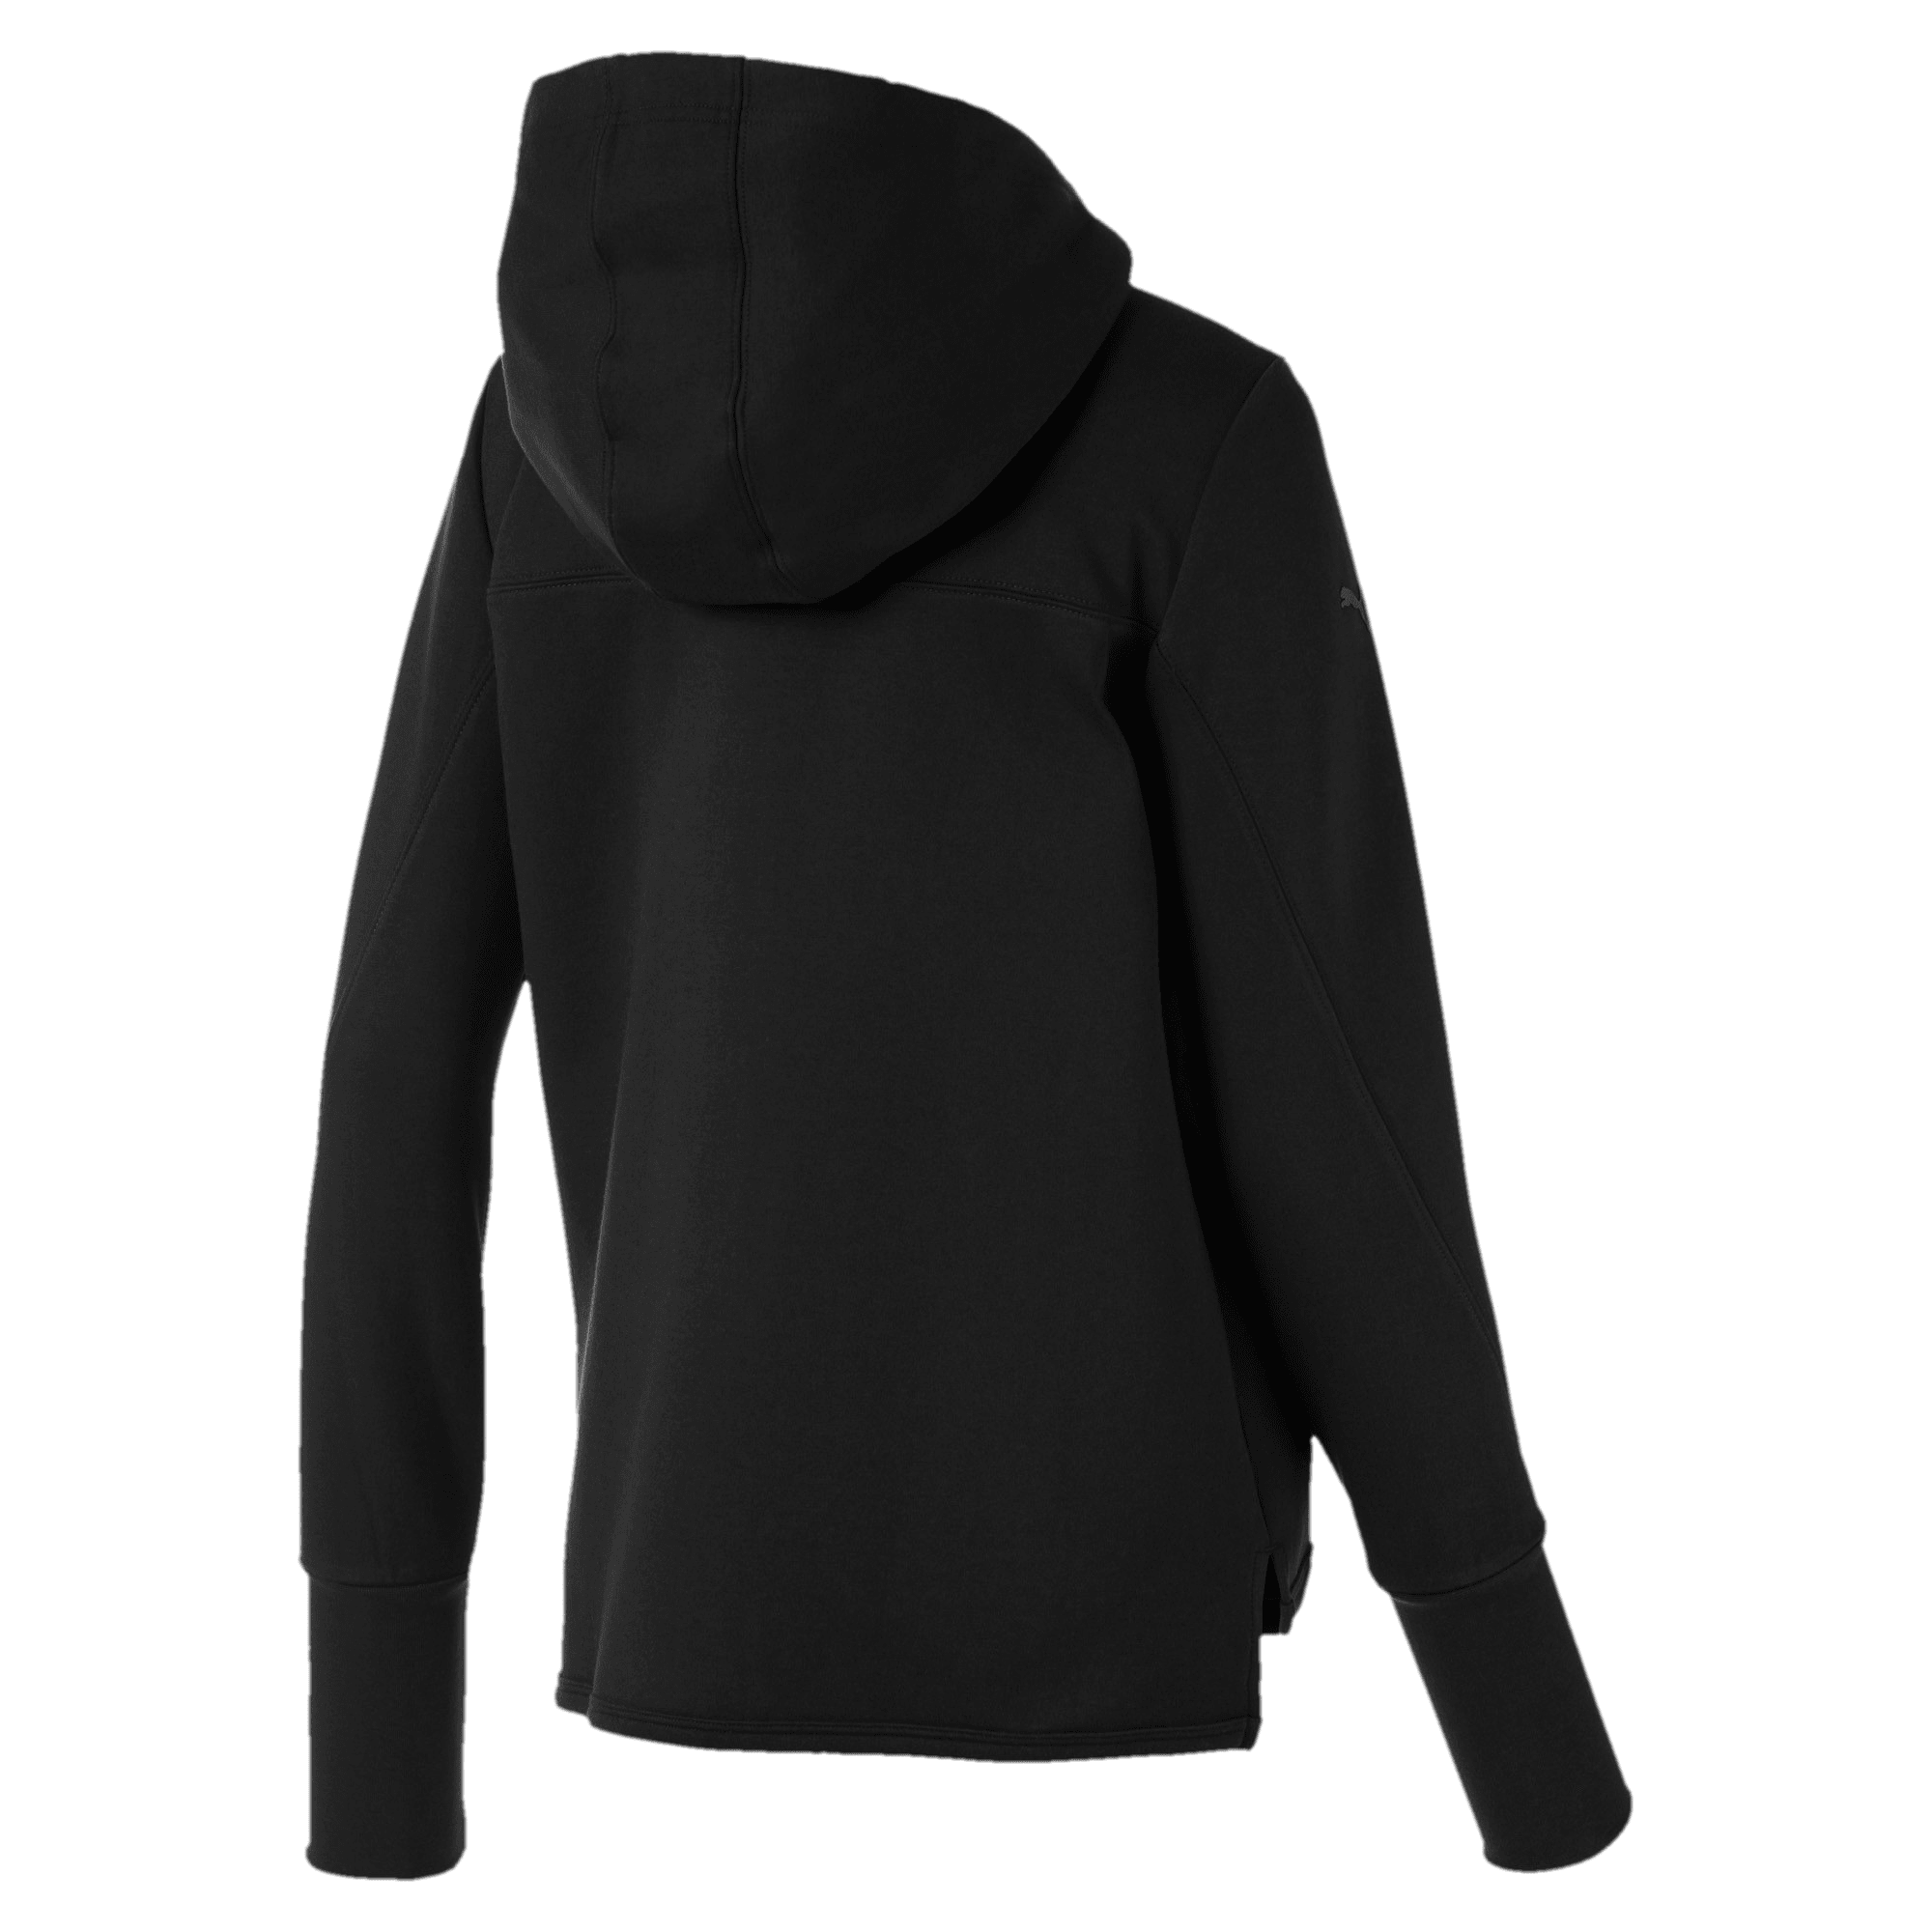 Thumbnail 2 of Scuderia Ferrari Women's Hooded Sweat Jacket, Puma Black, medium